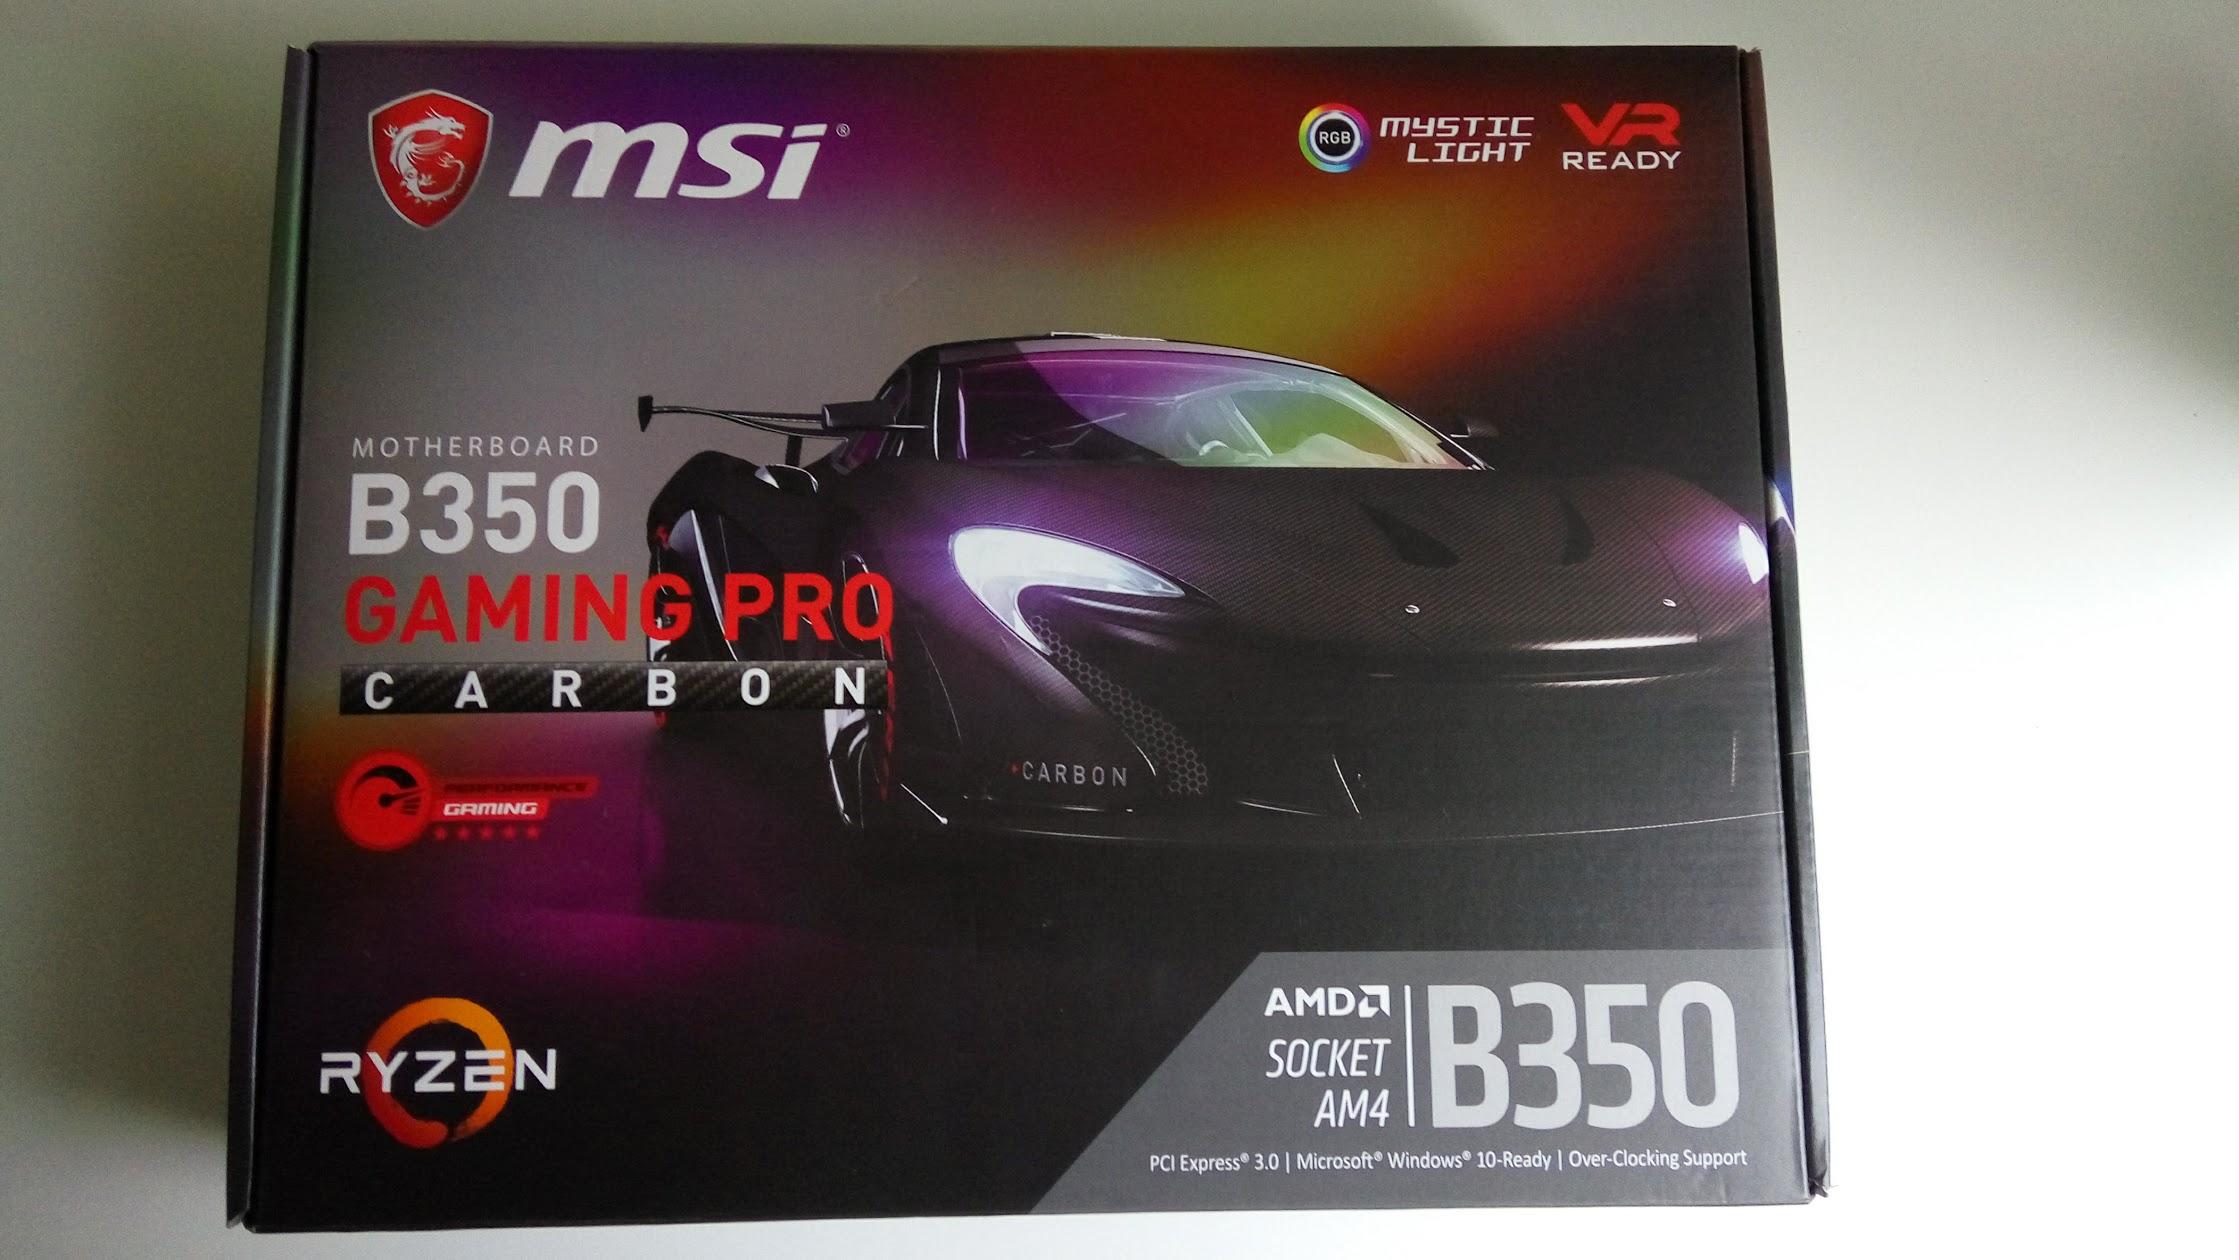 MSI B350 GAMING PRO CARBON OD 1ZL AM4 Ryzen